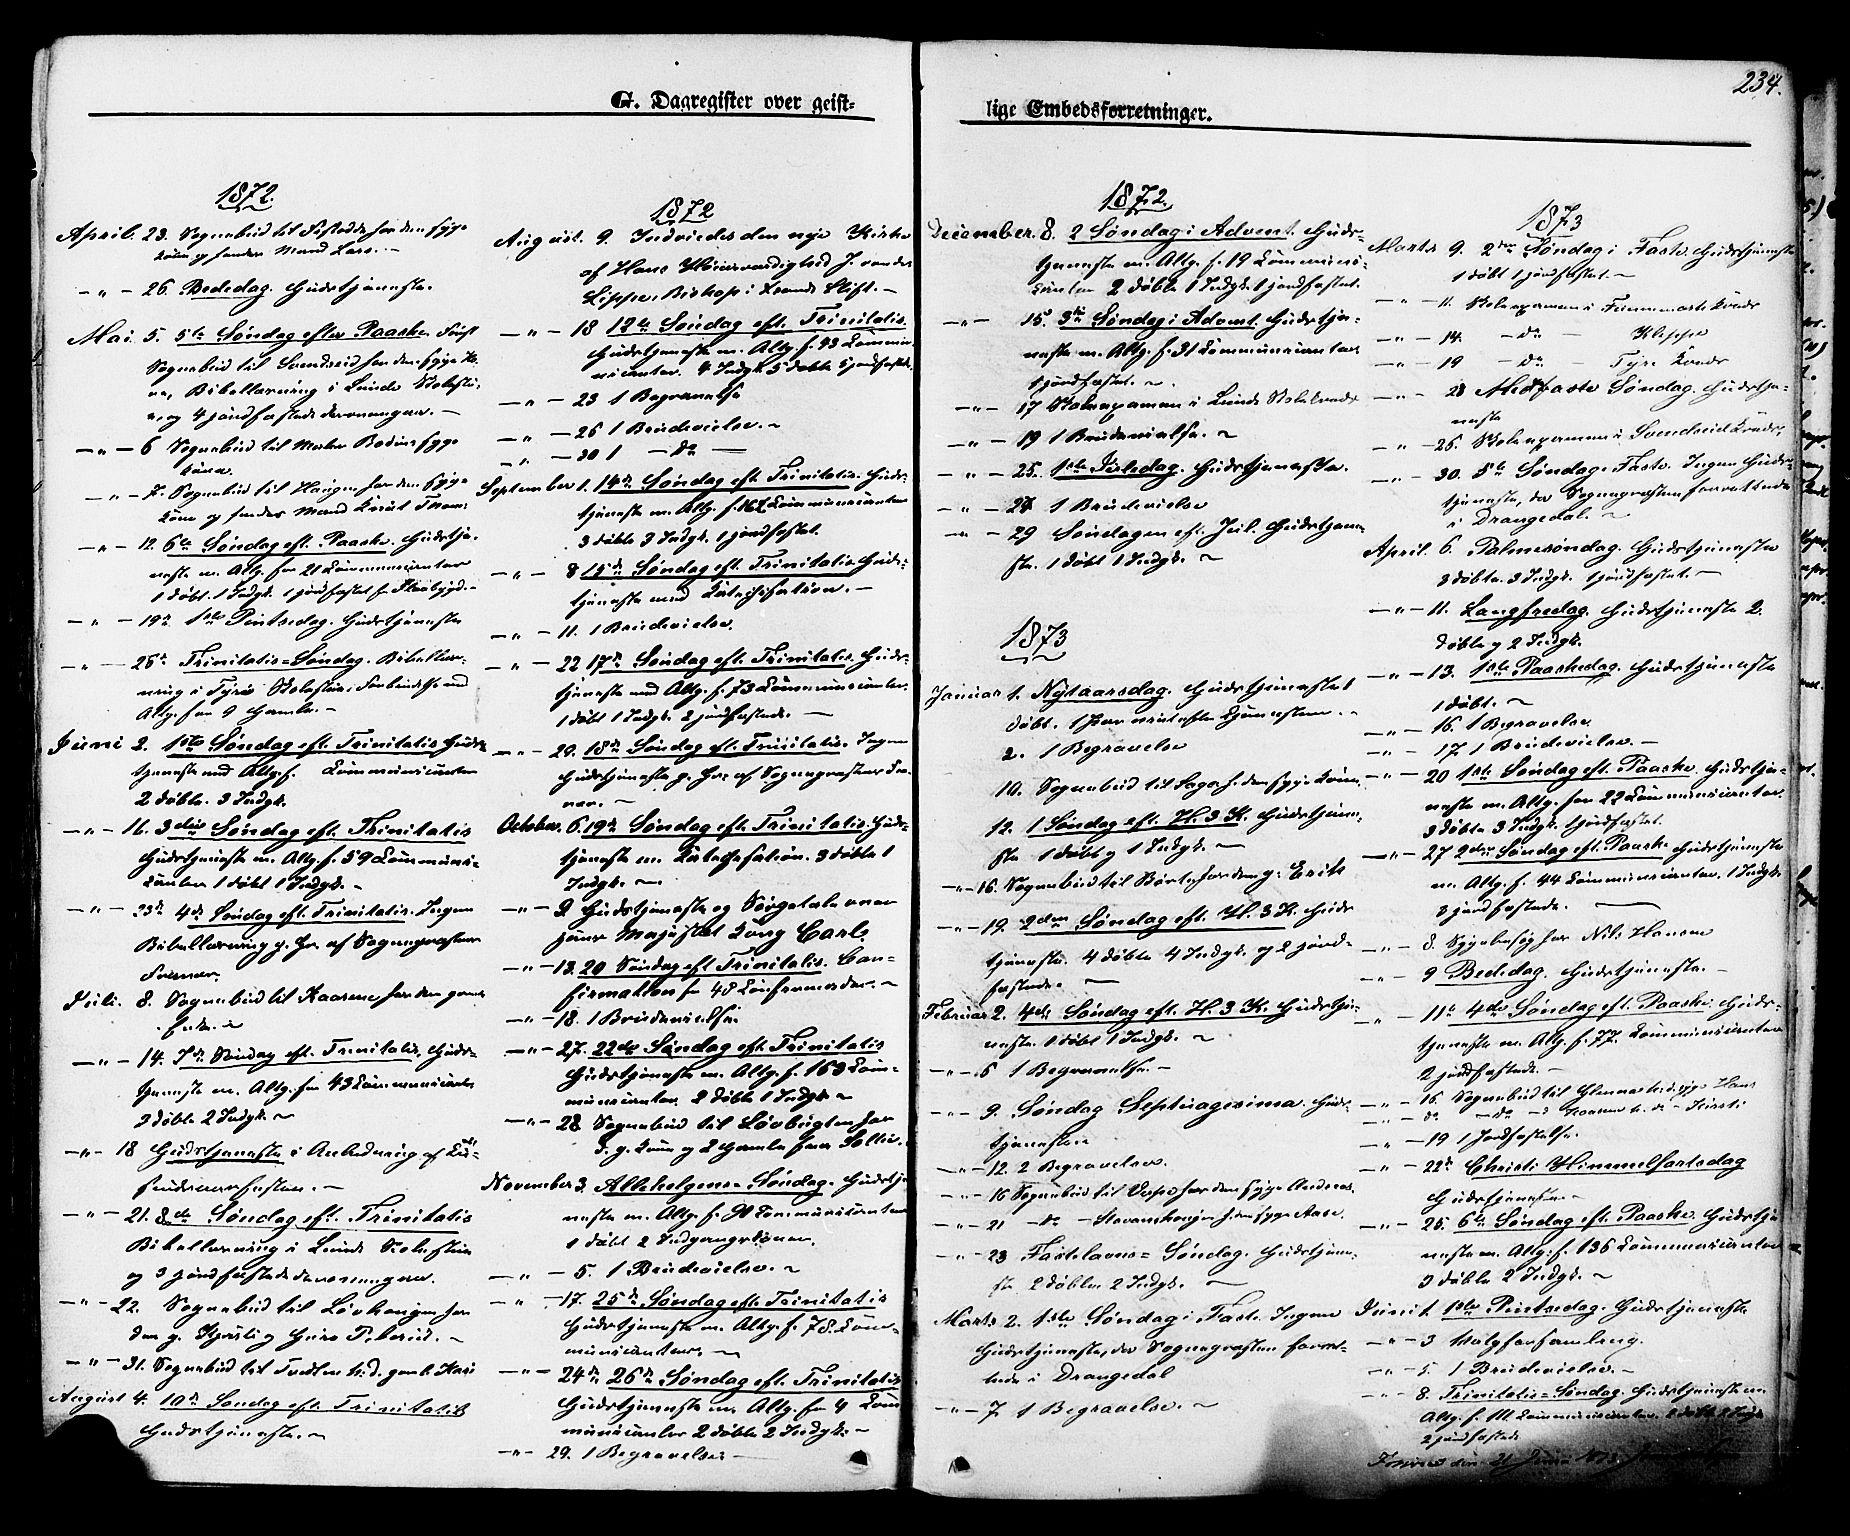 SAKO, Lunde kirkebøker, F/Fa/L0001: Ministerialbok nr. I 1, 1866-1883, s. 234